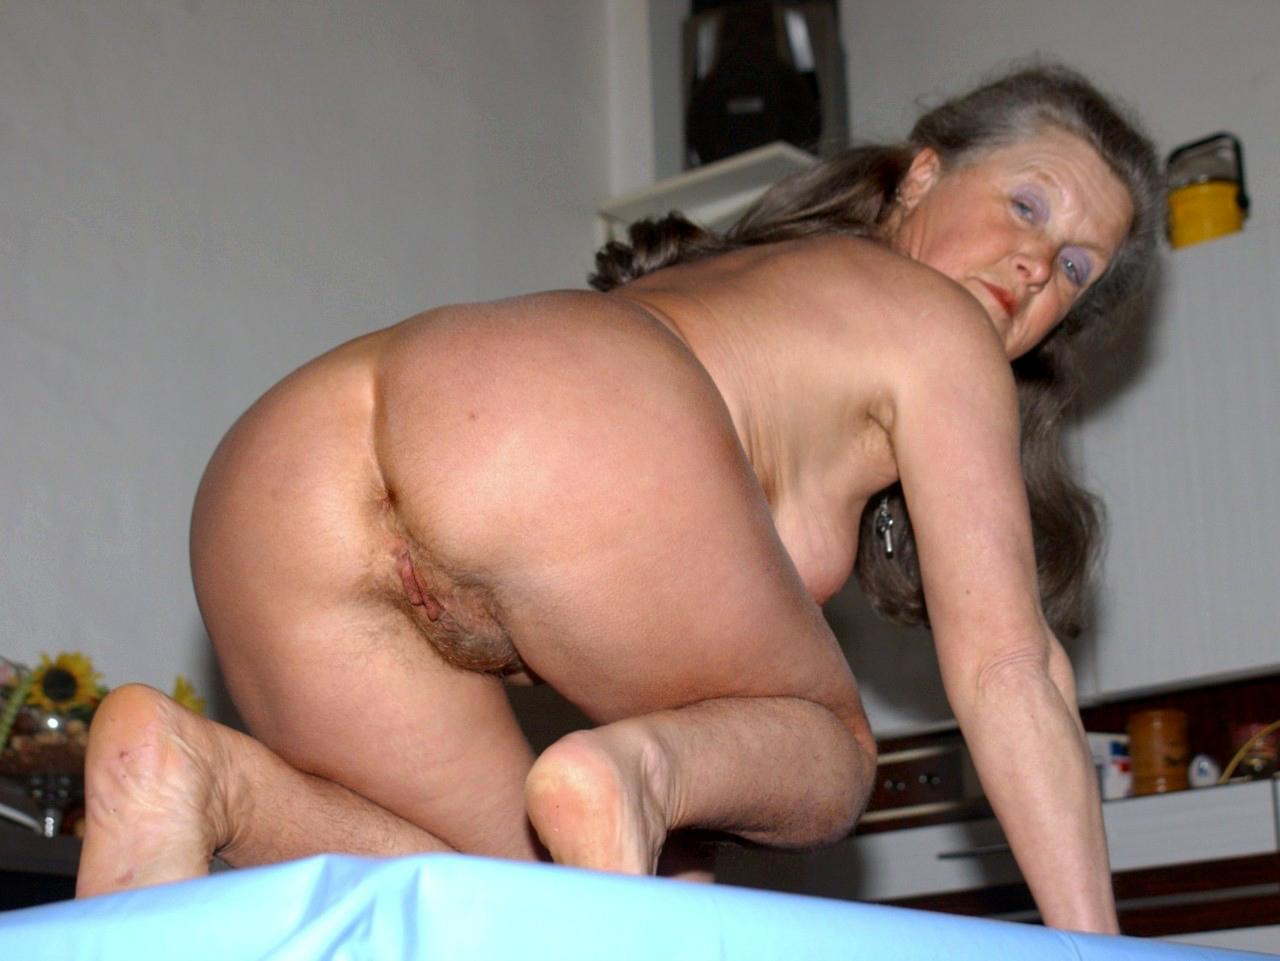 German grandma needs a daily dose of cum 4